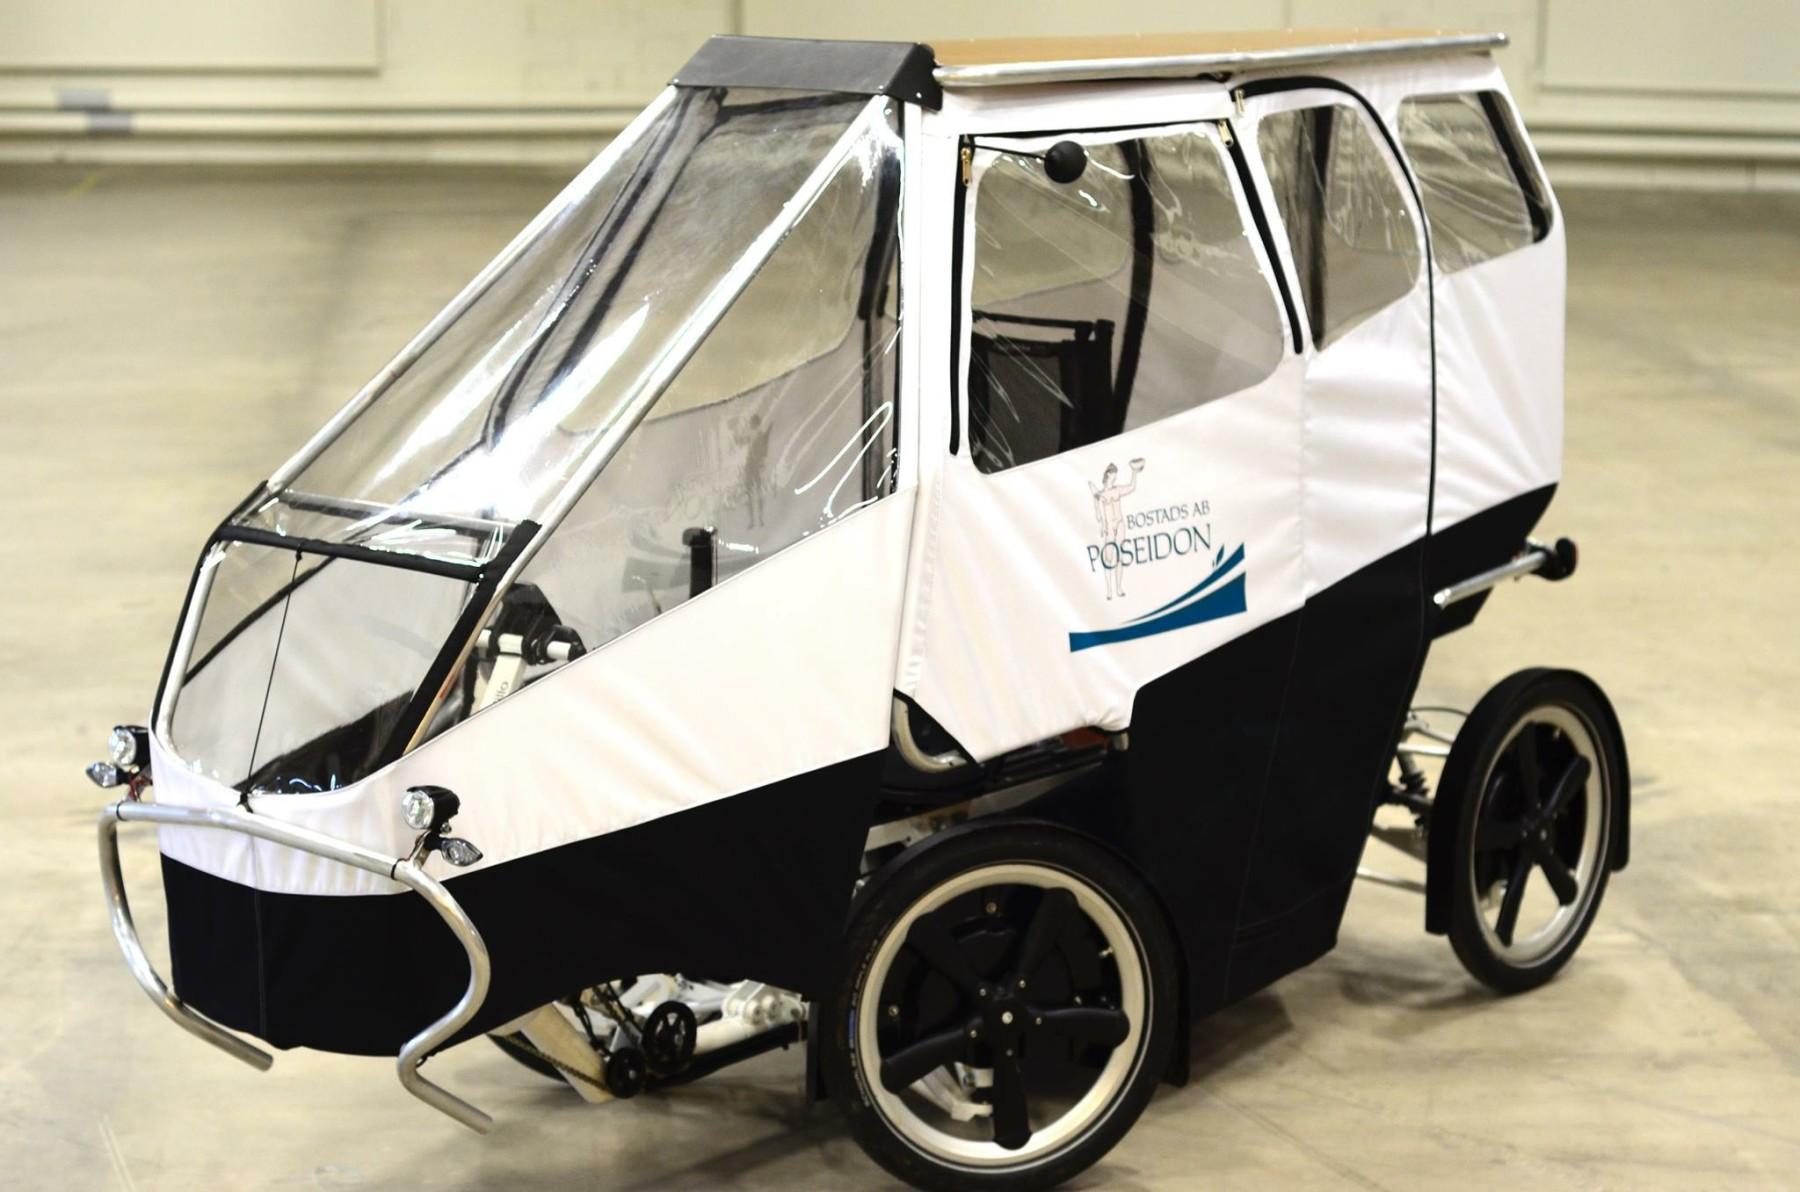 Velove Armadillo two-seater